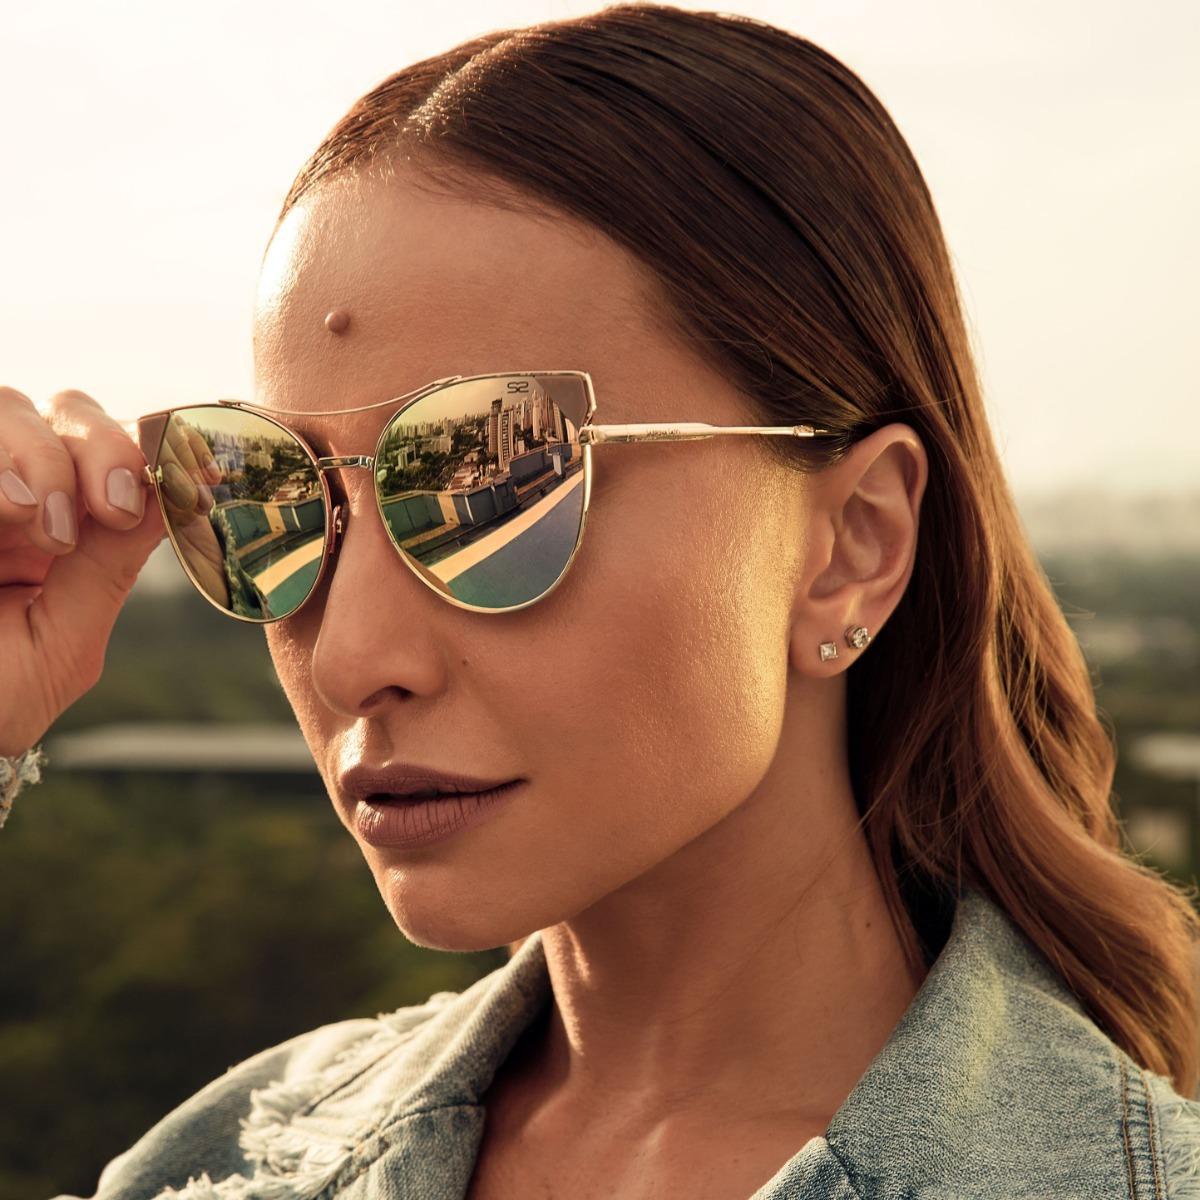 e282c16605f11 óculos de sol sabrina sato - sb7013 c4 - dourado. Carregando zoom.